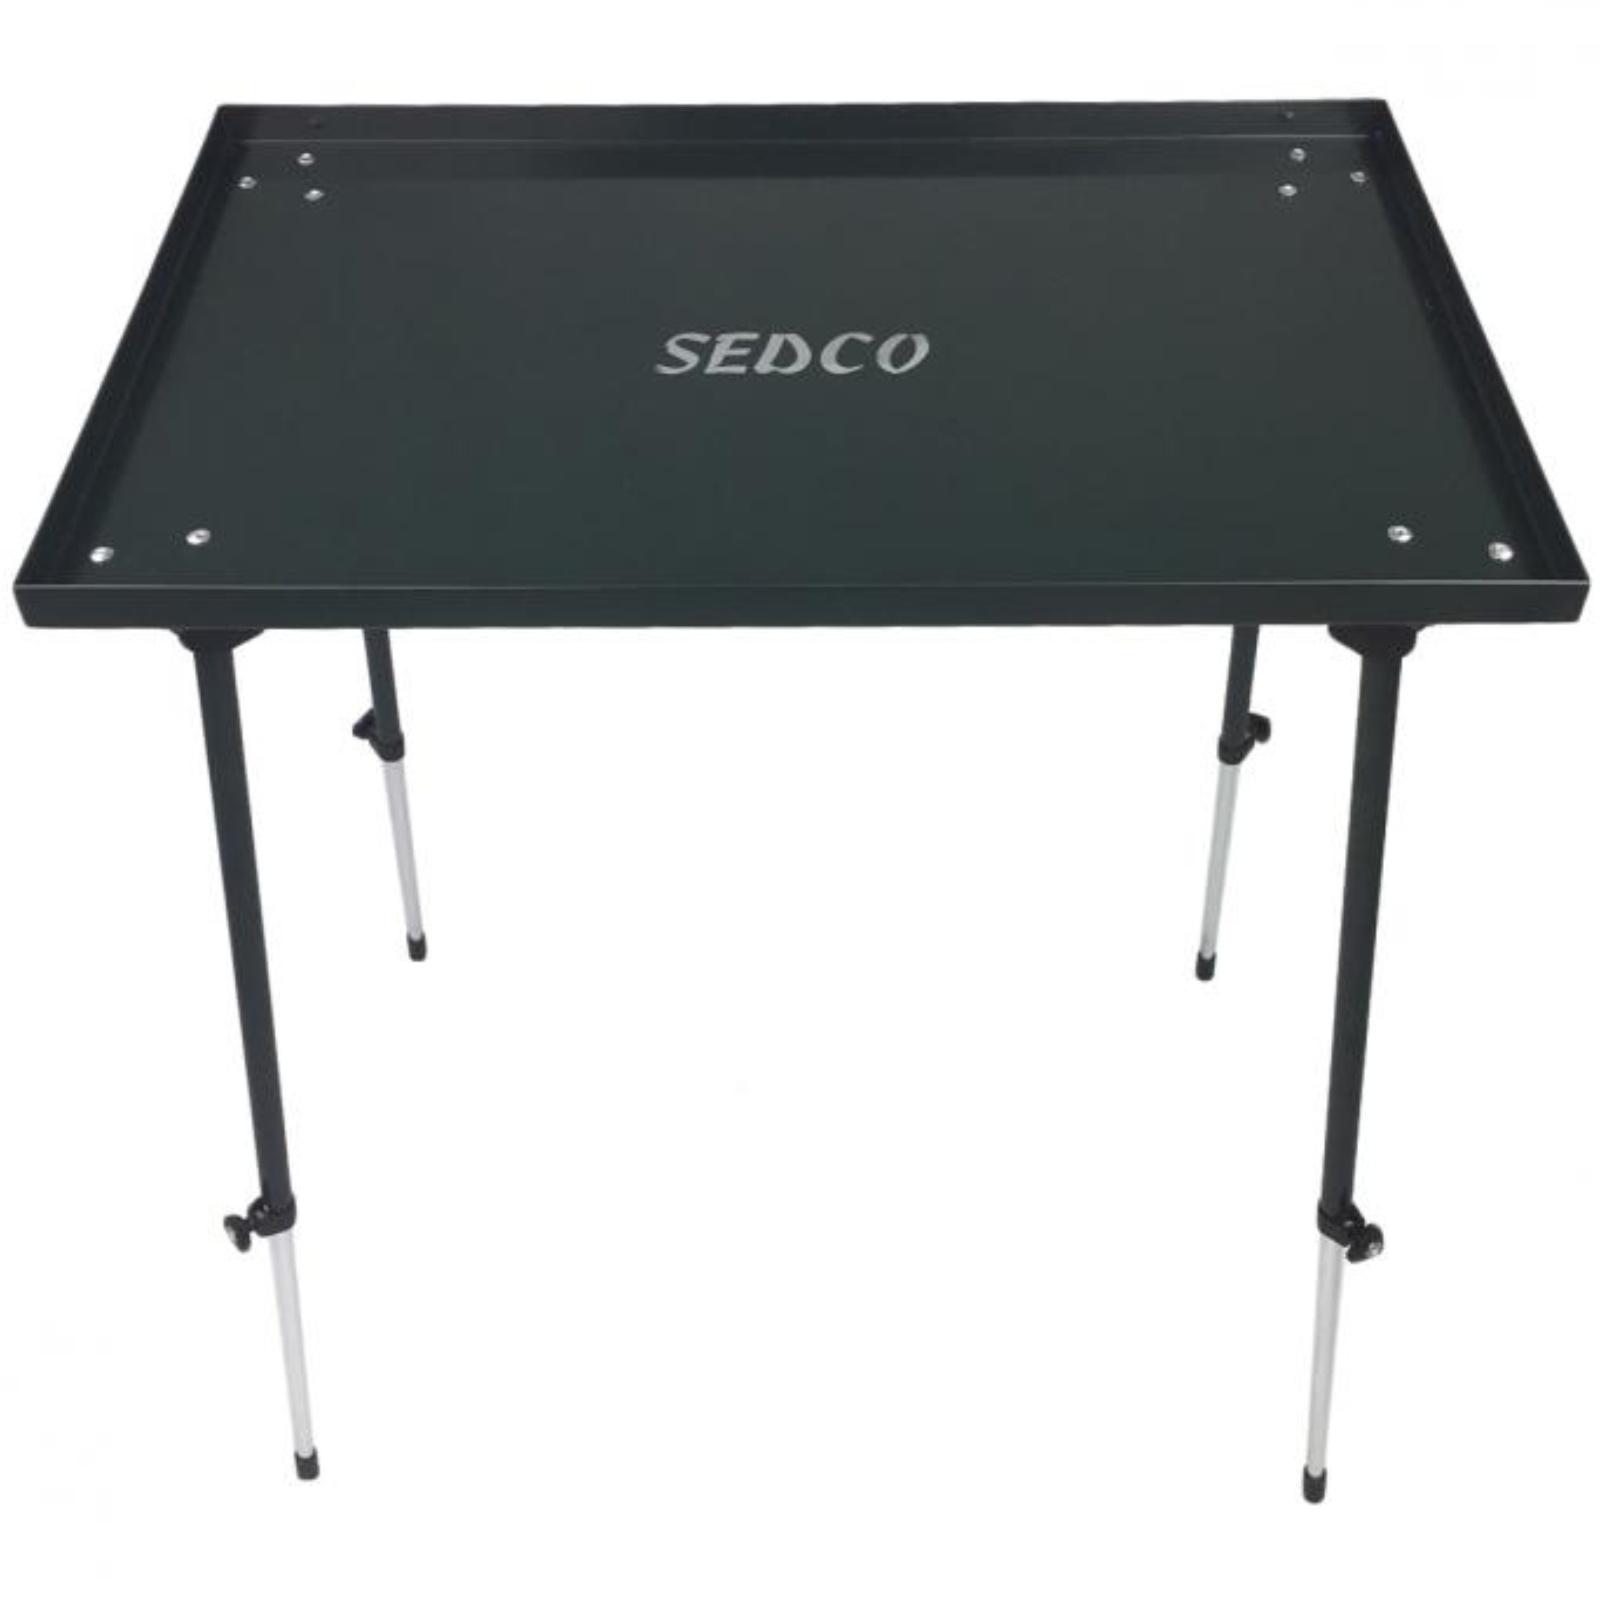 Rybářský stolek SEDCO Carper Biivy